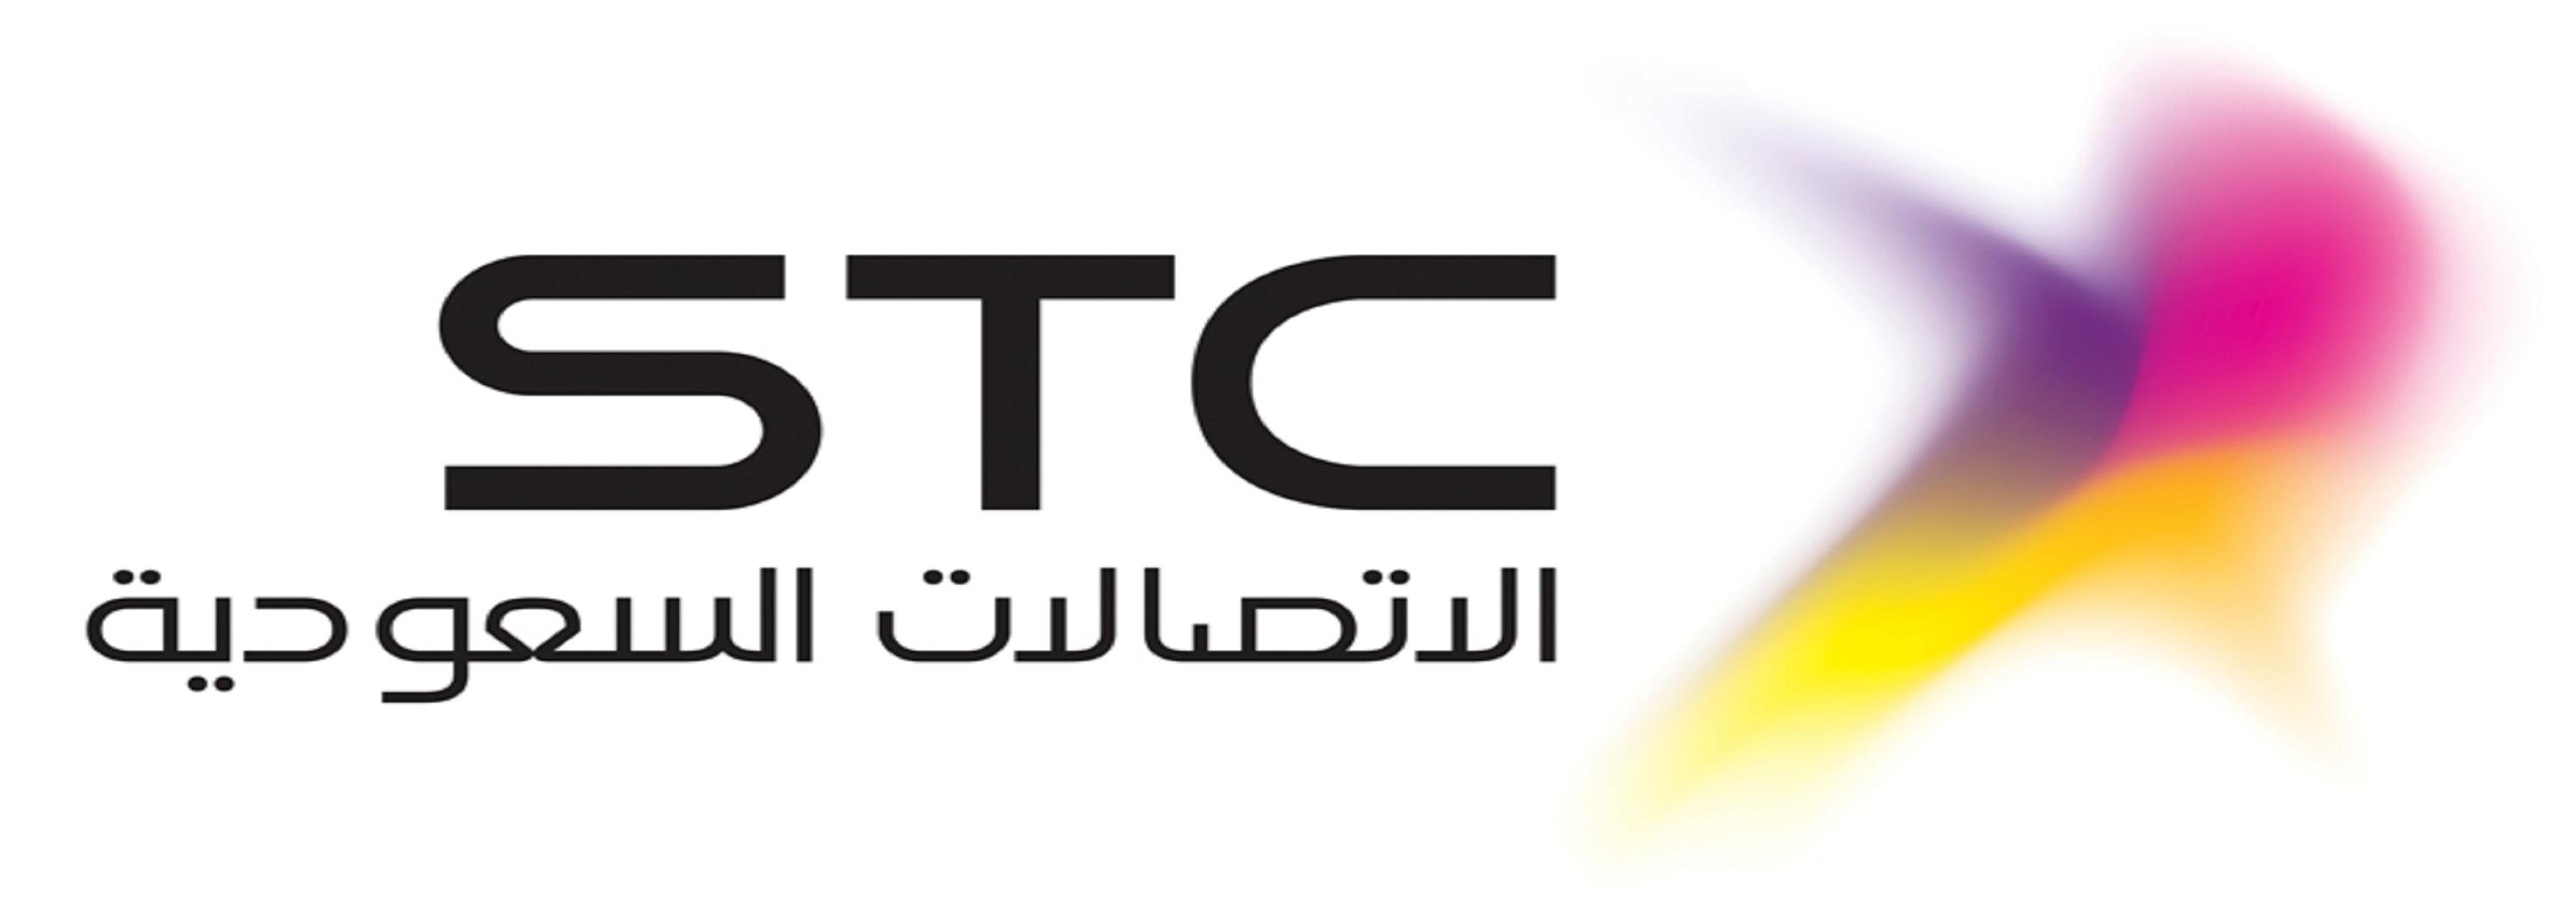 1STC-logo.jpg